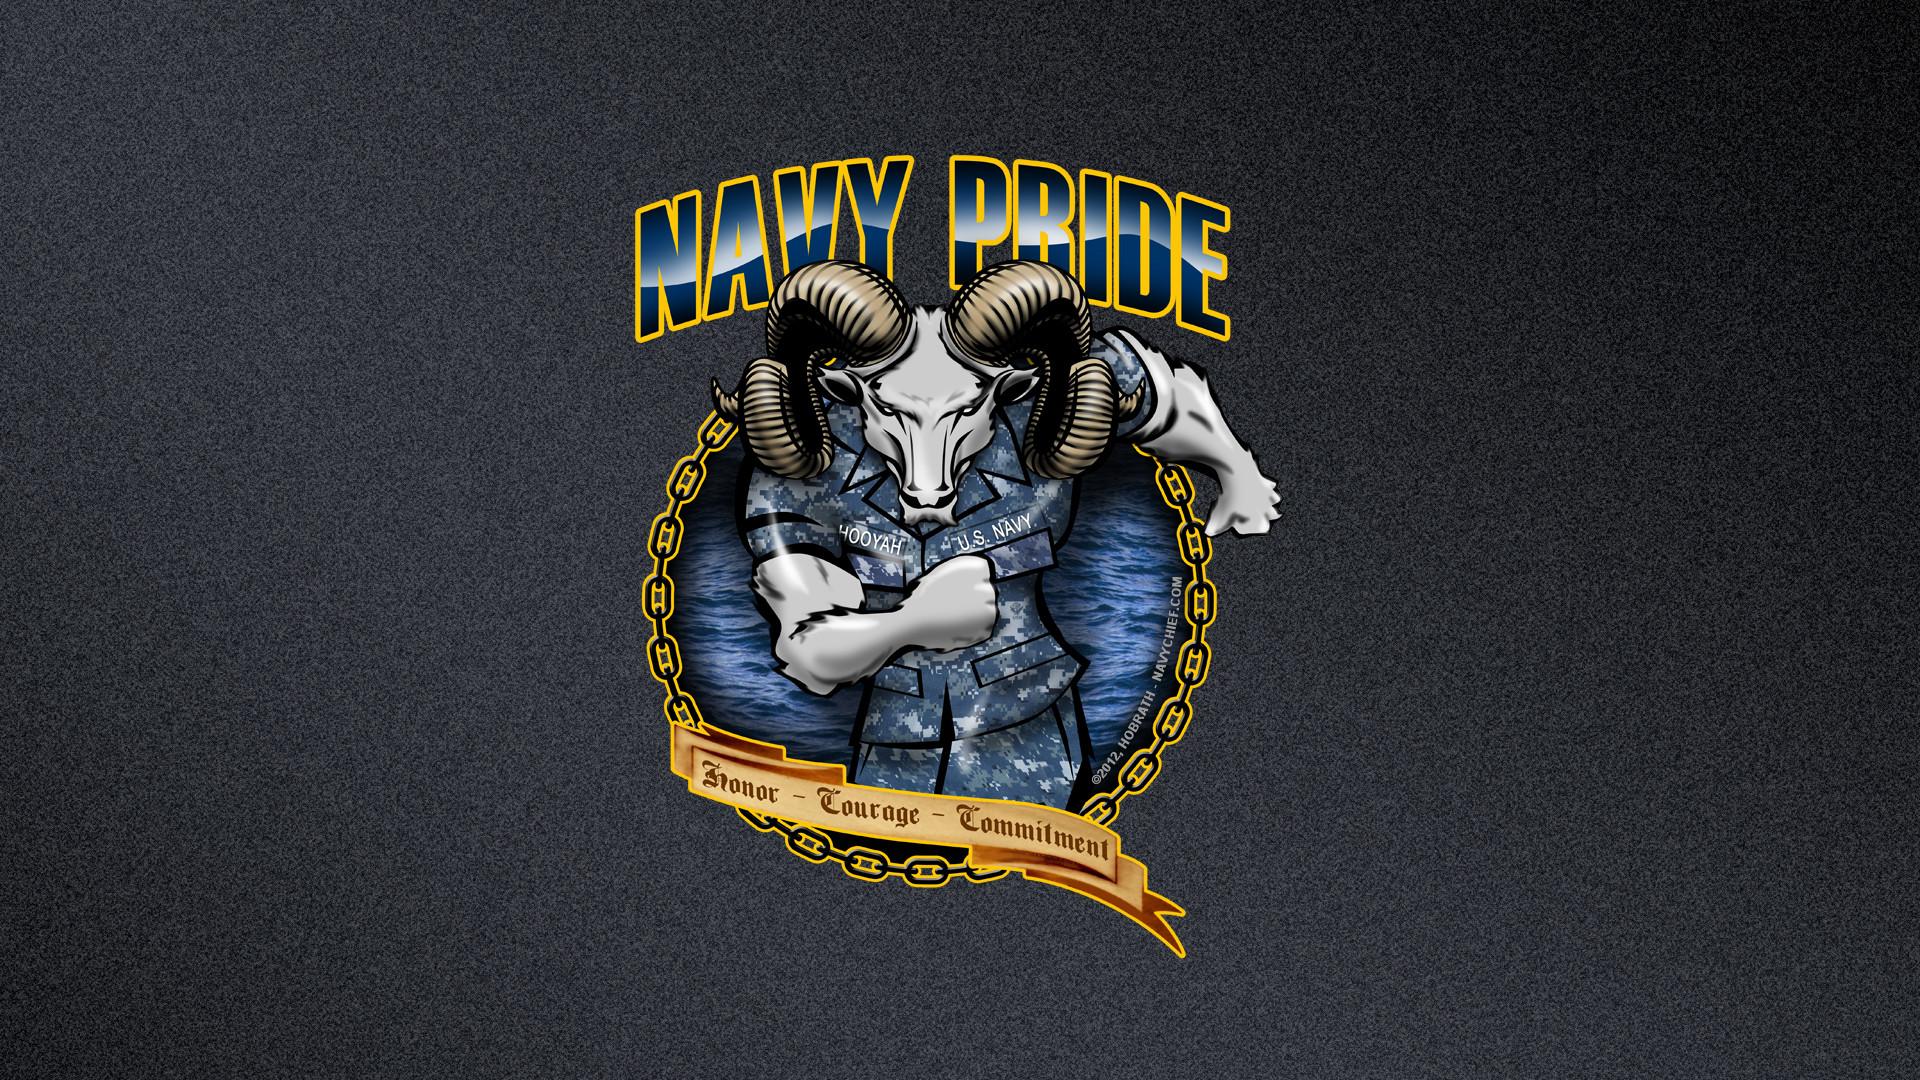 navy seal logo wallpaper 61 images